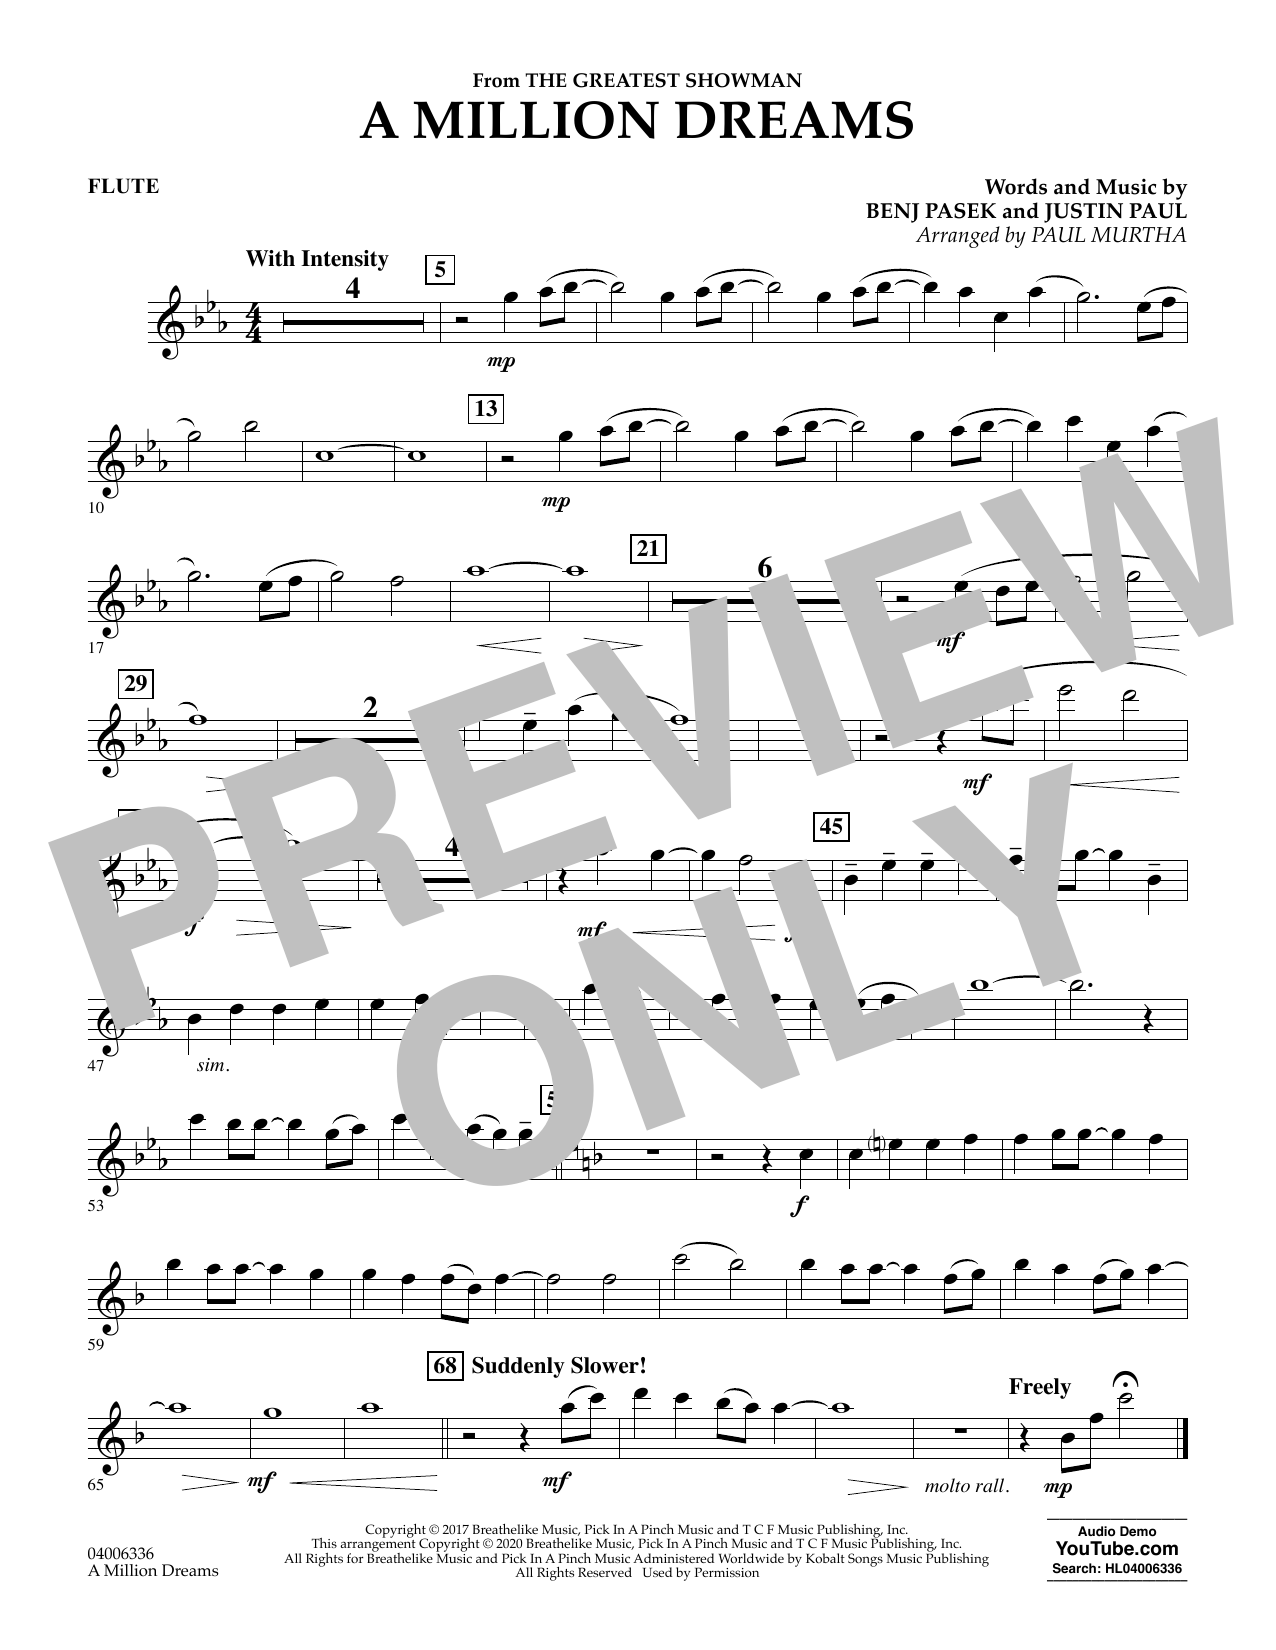 A Million Dreams (from The Greatest Showman) (arr. Paul Murtha) - Flute (Concert Band)